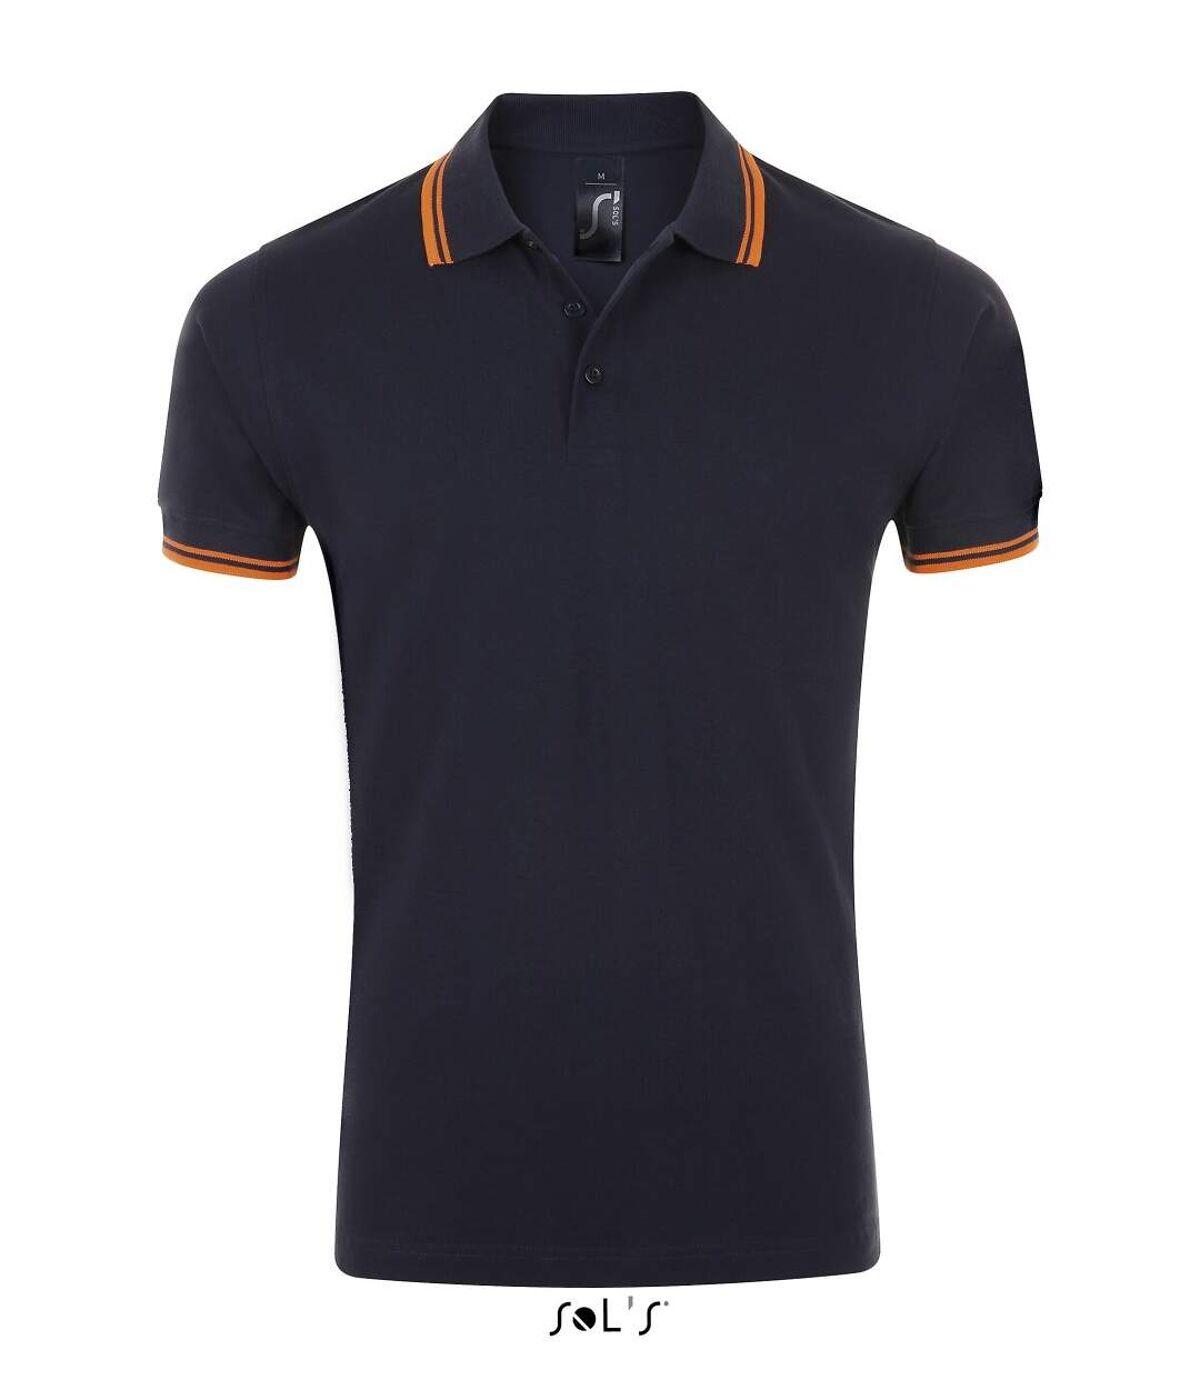 Polo homme coton - 00577 - bleu marine et bande orange